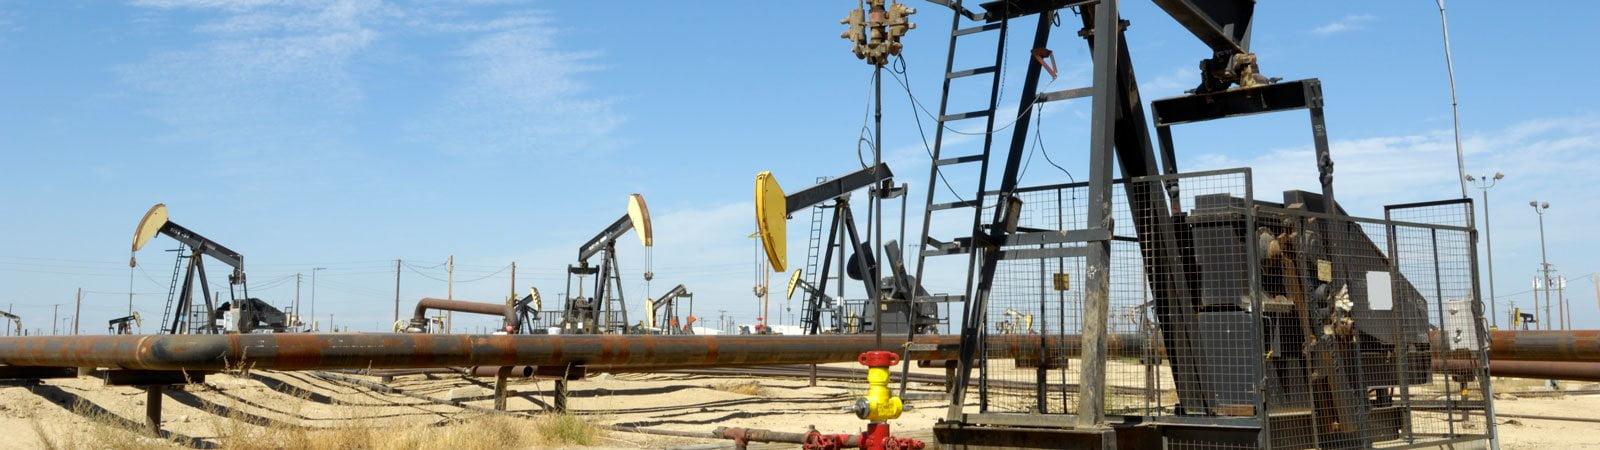 Oil Field Energy Industry Testing